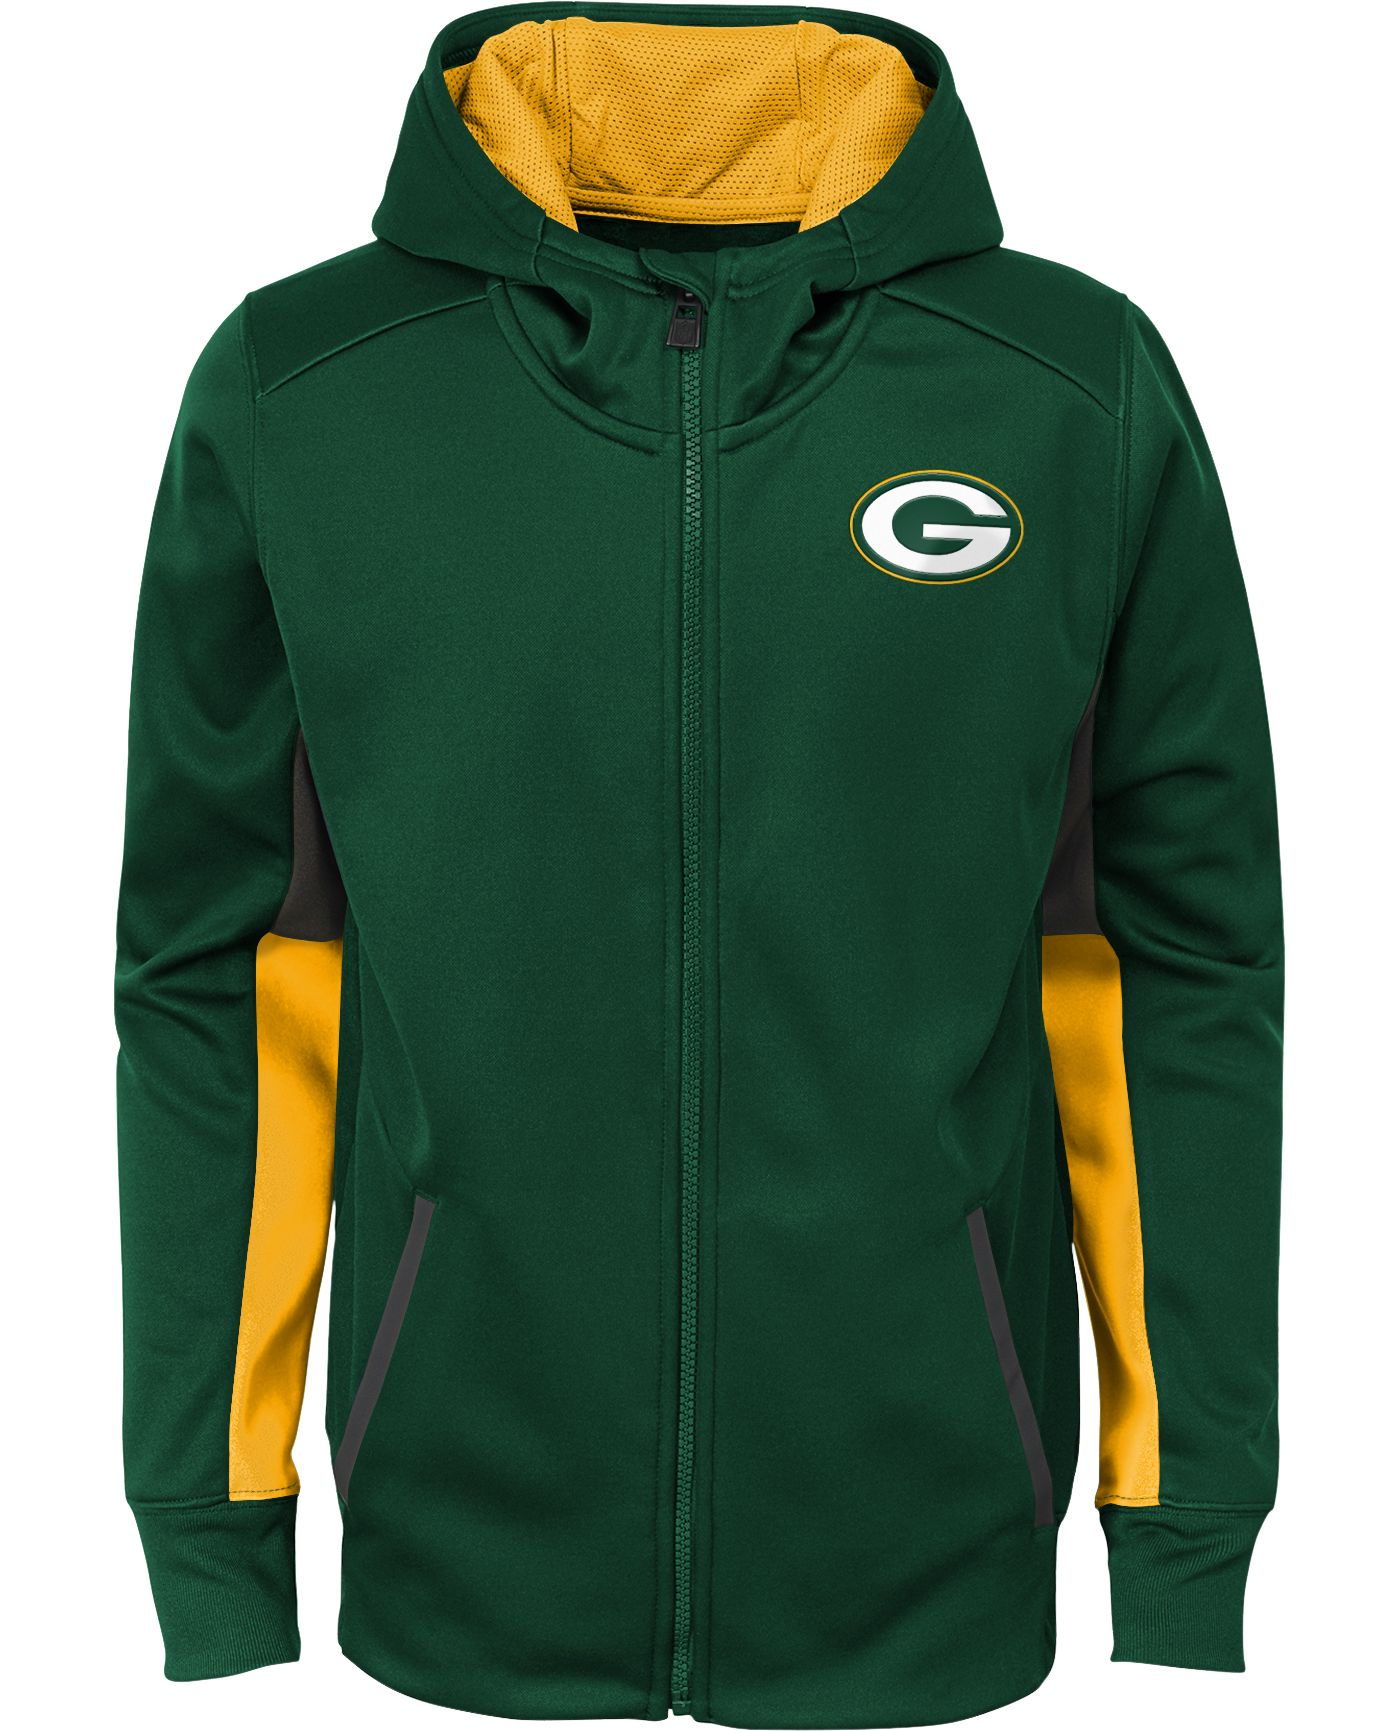 NFL Team Apparel Youth Green Bay Packers Performance Green Full-Zip Hoodie